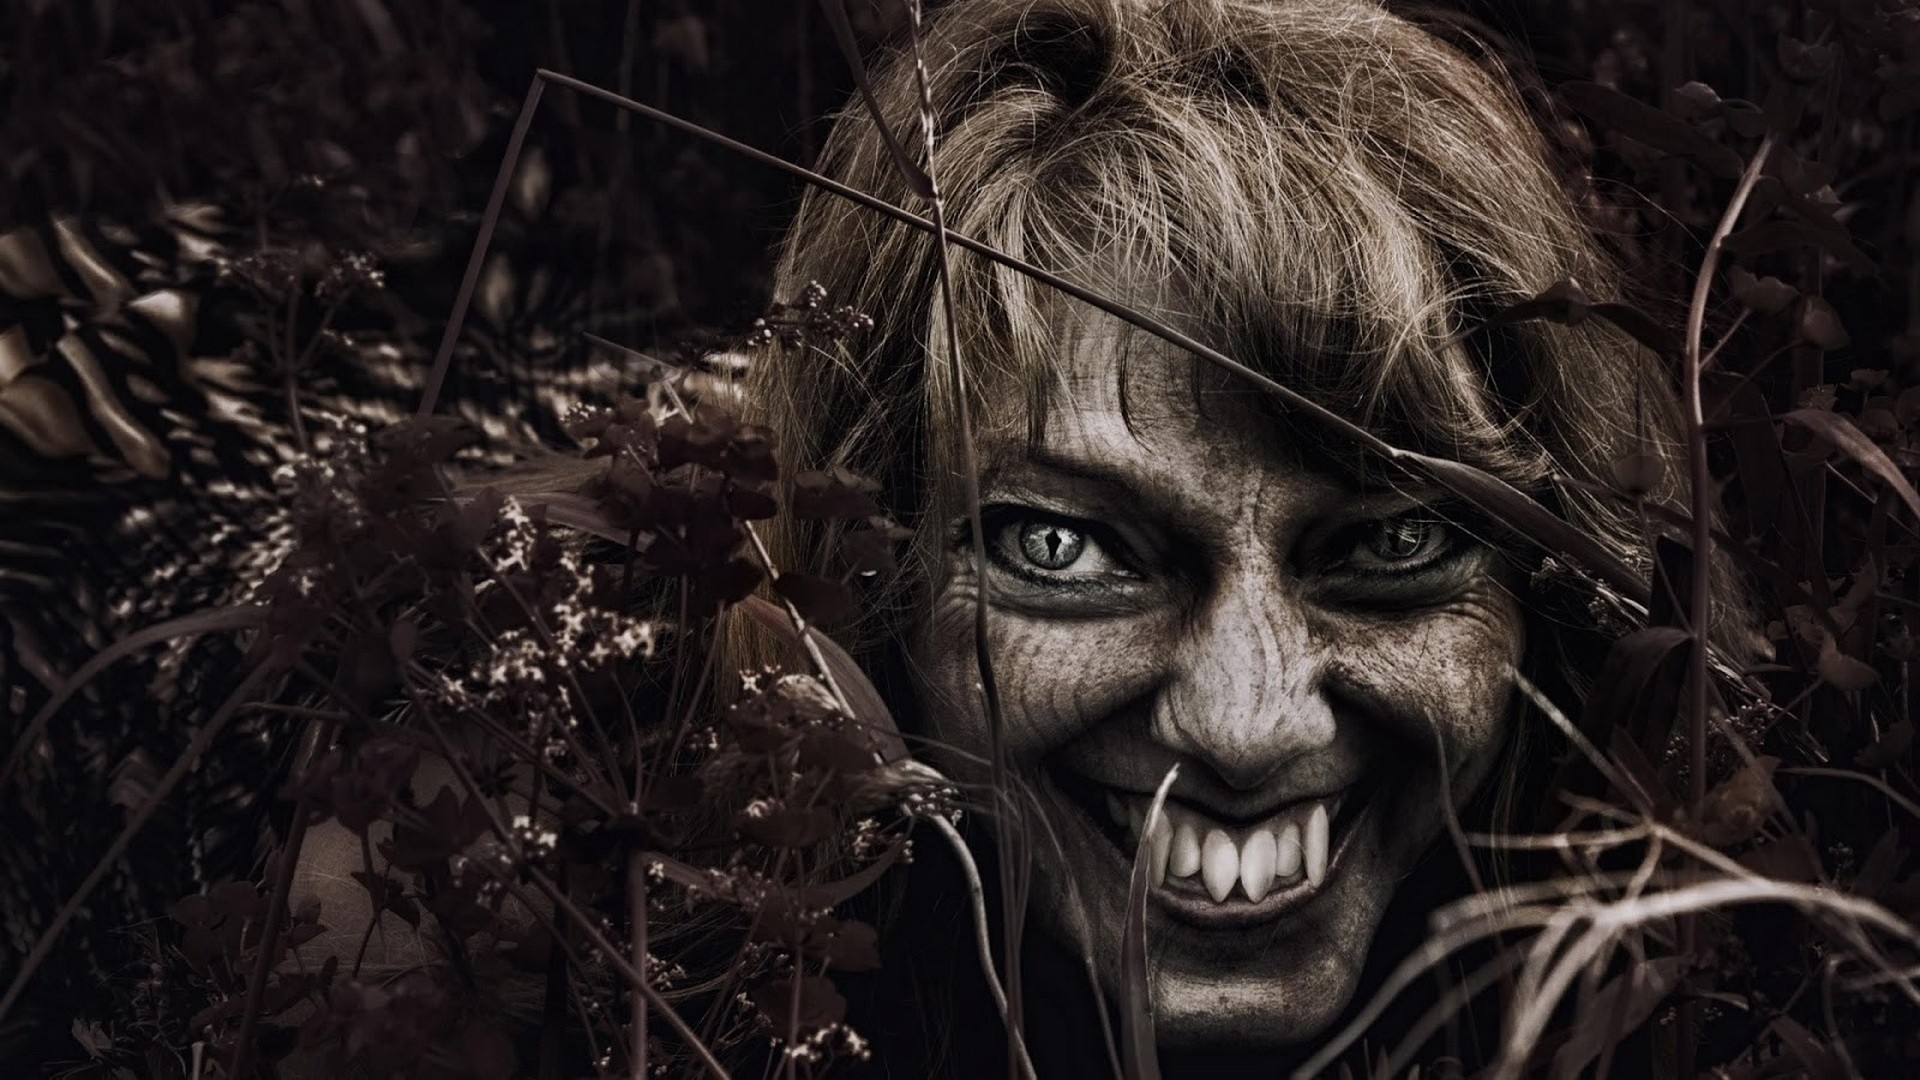 General 1920x1080 vampires wood demon horror teeth women sepia face photo manipulation dark creature eyes